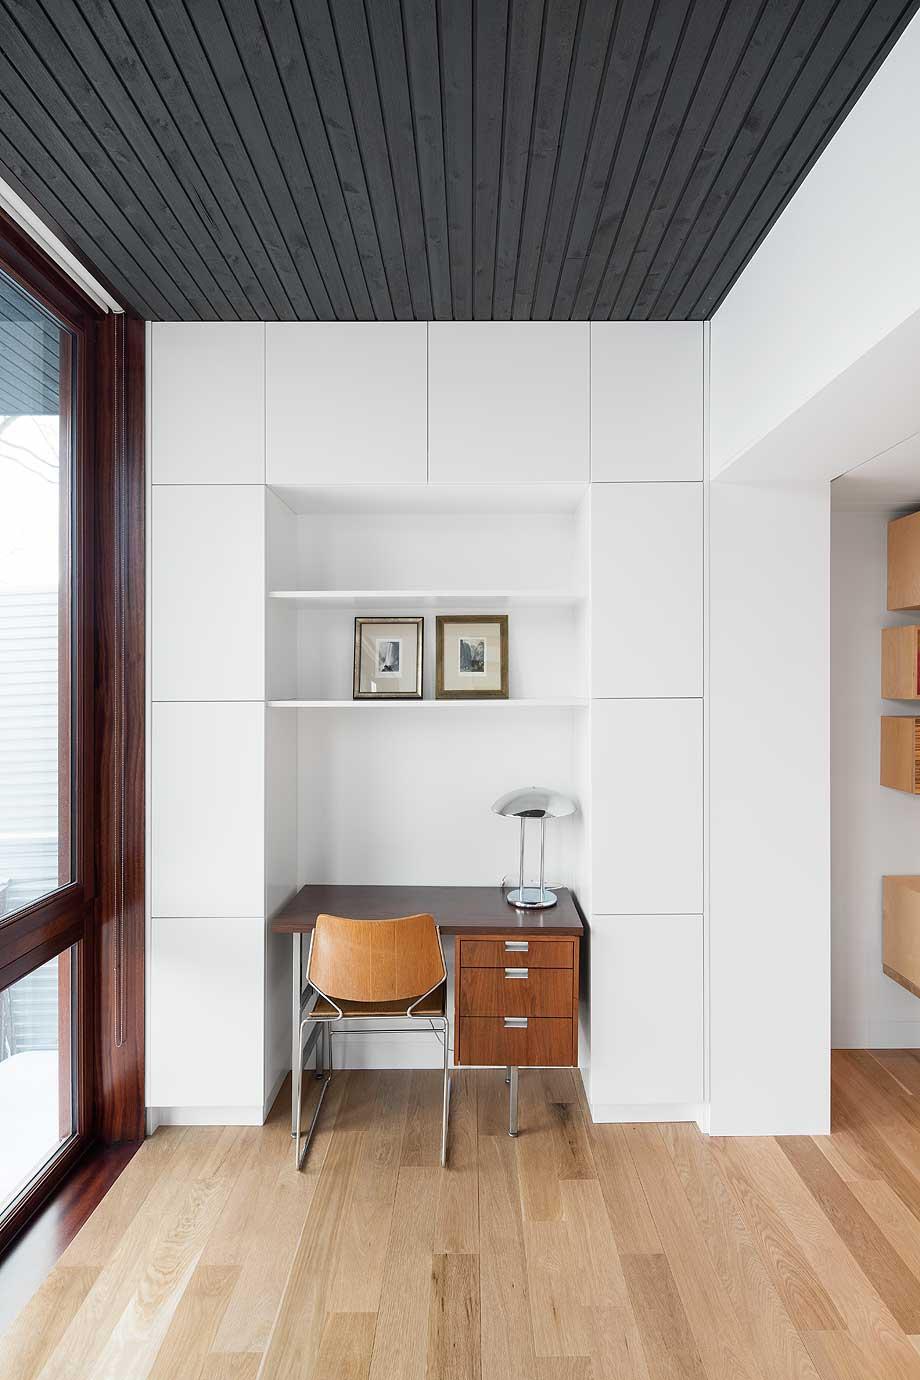 hotel-de-ville-residence-architecture-microclimat (8)